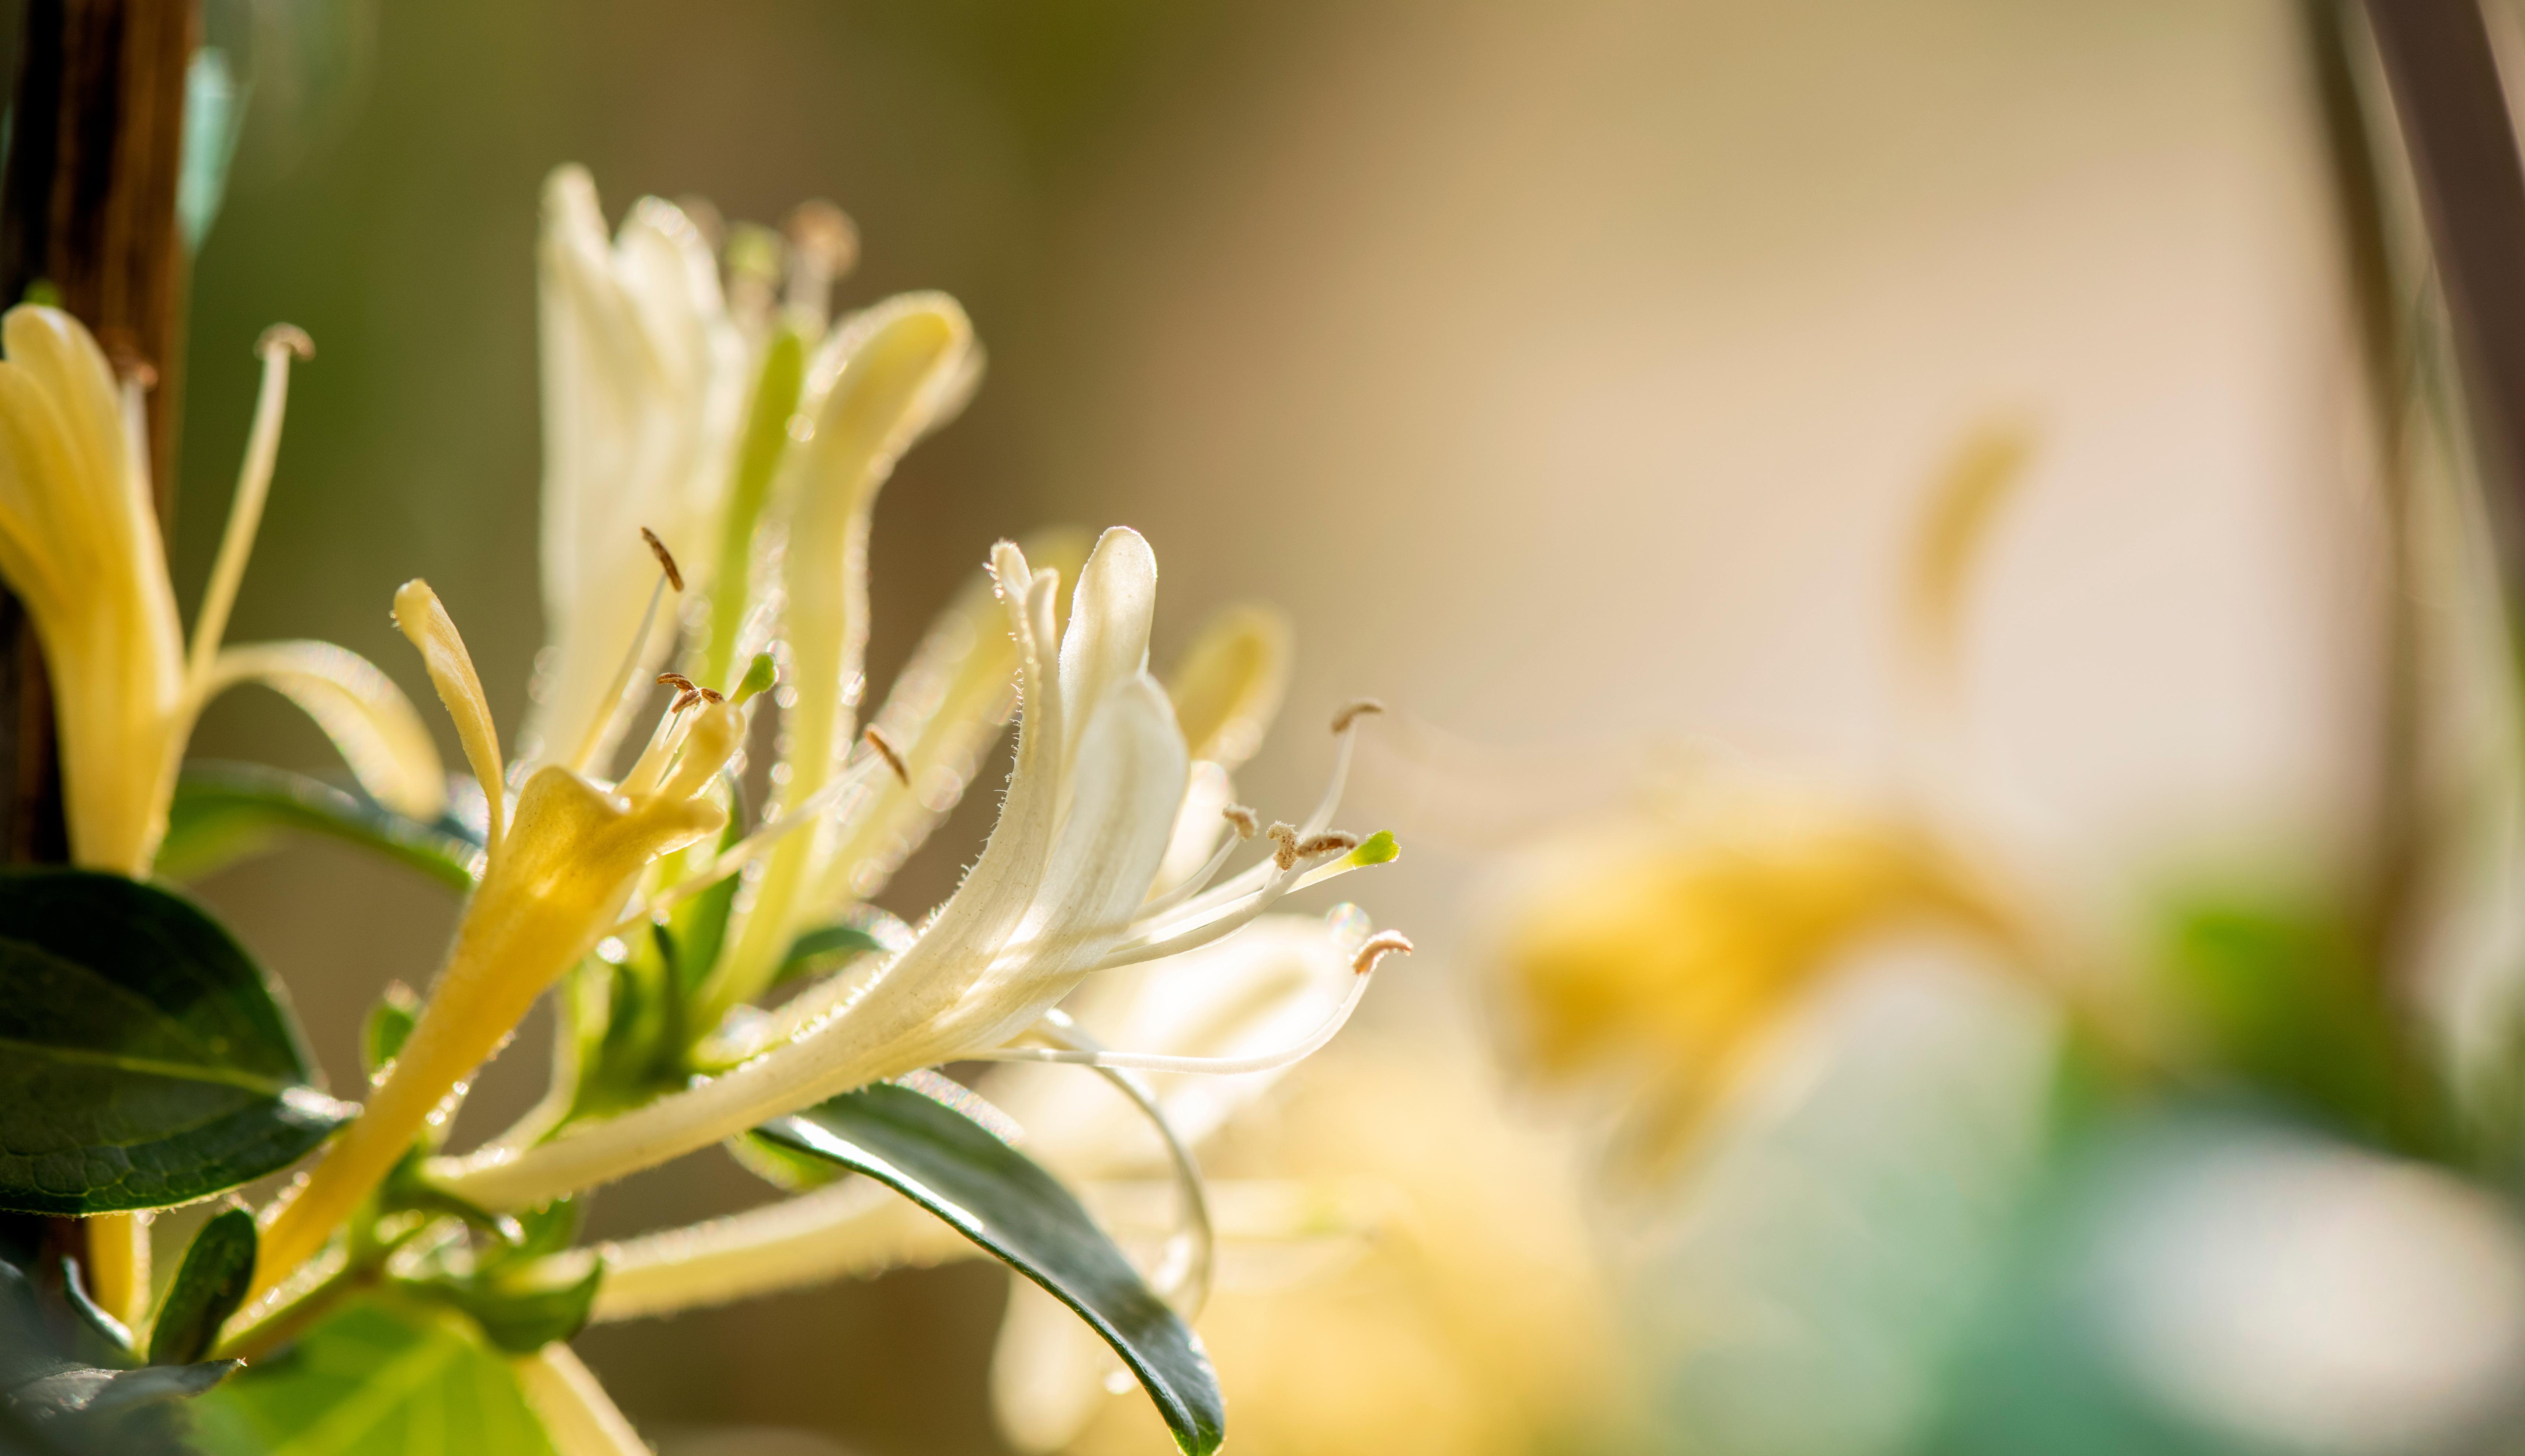 Yellow honeysuckle flowers over blurred background.